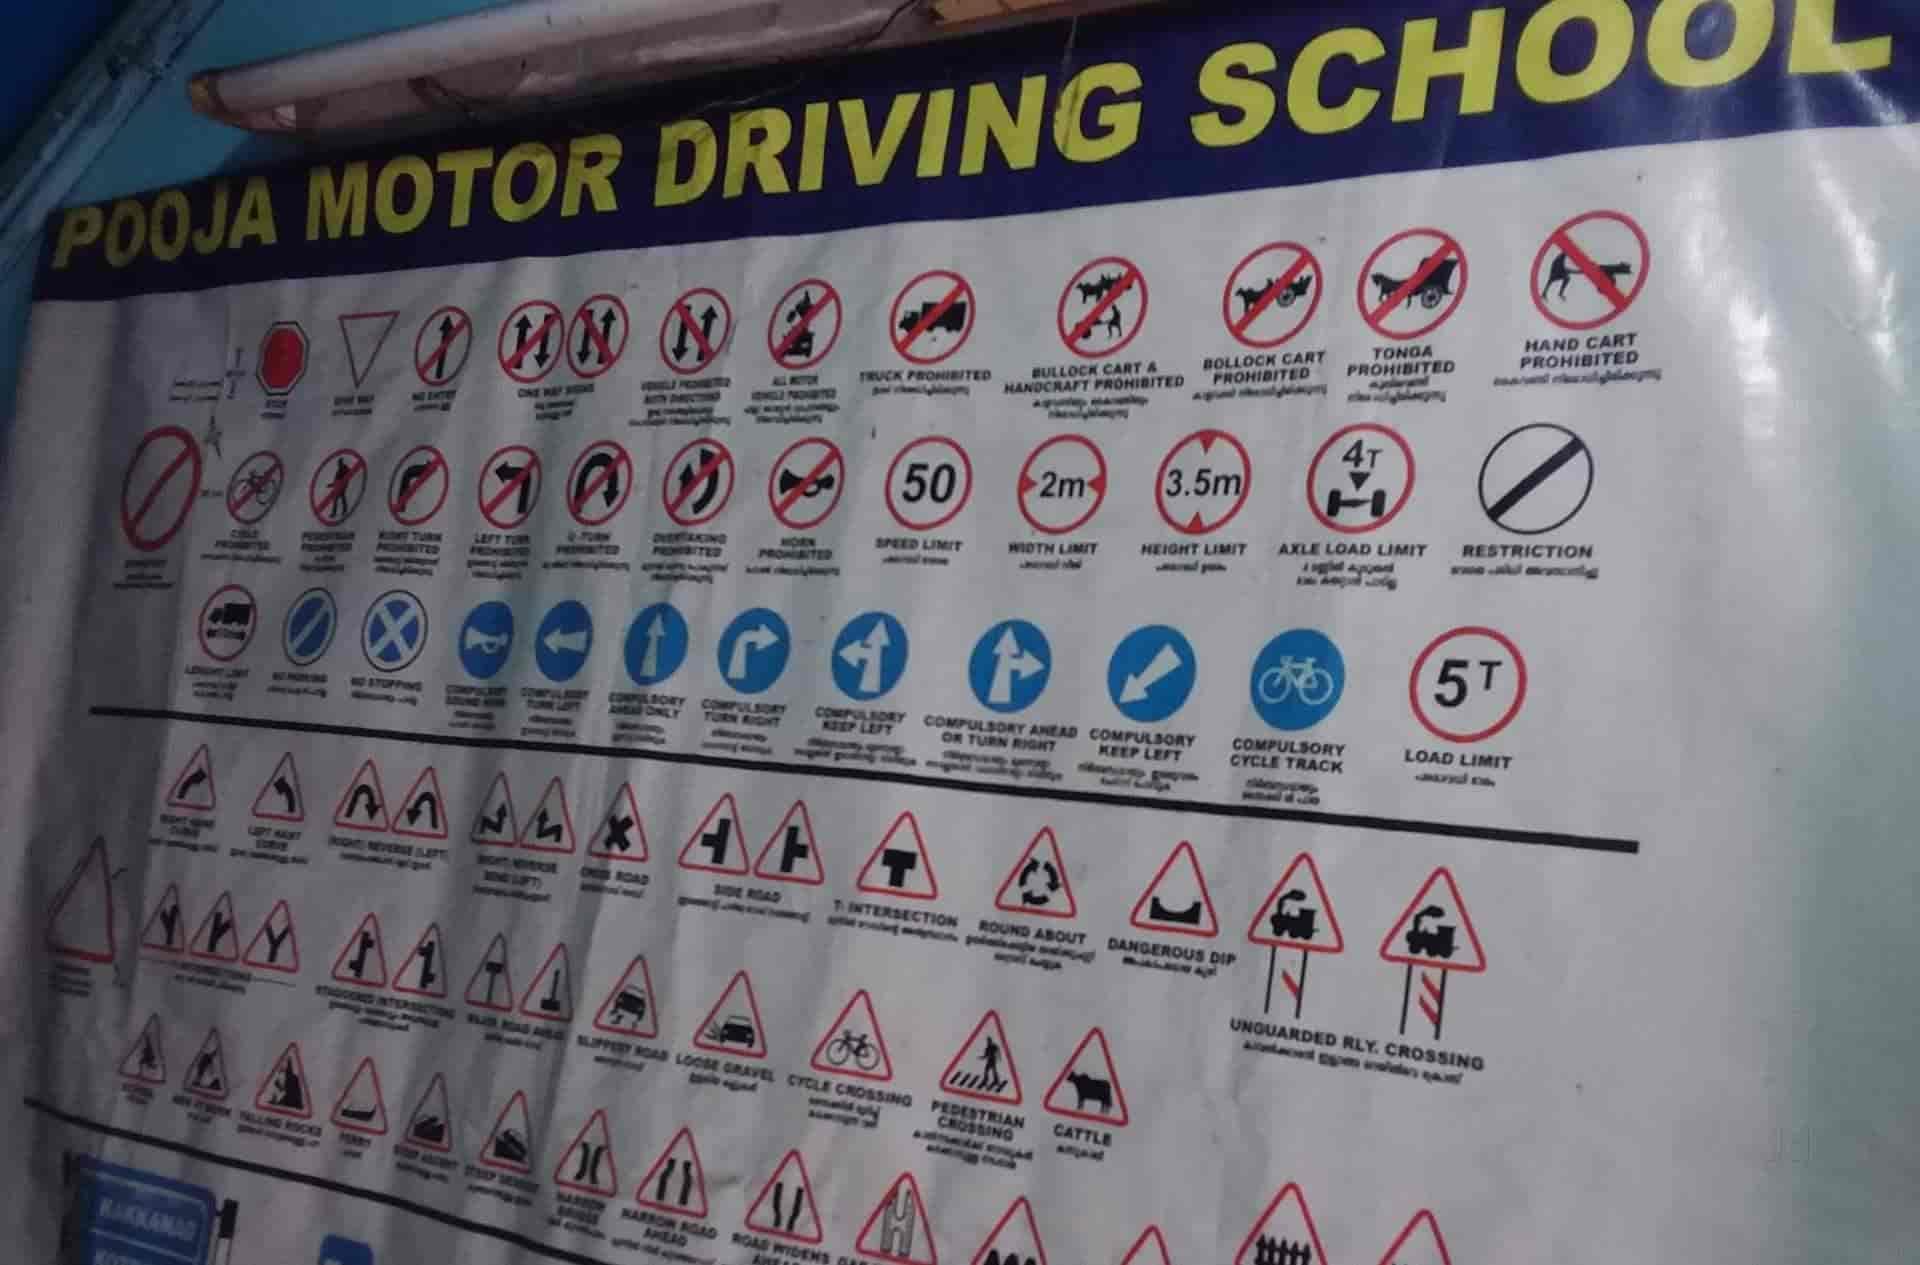 Pooja Motor Driving School, Poojappura - Motor Training Schools in